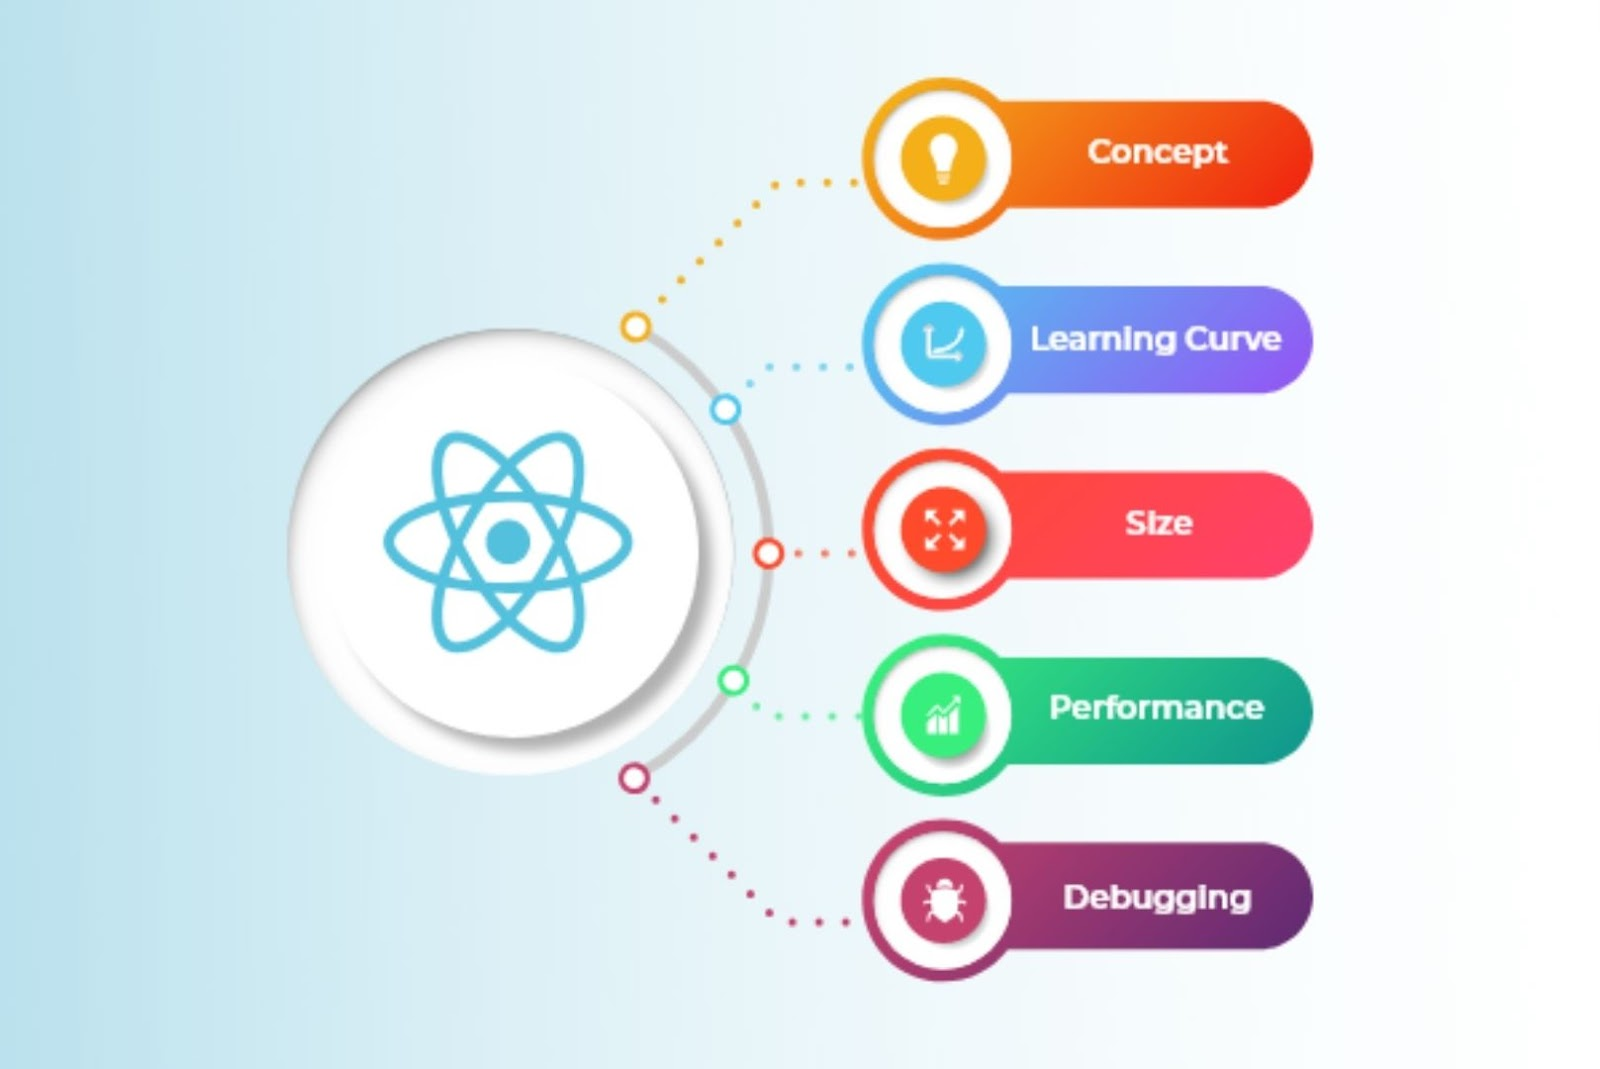 Reasons to use reactjs for enterprise app development